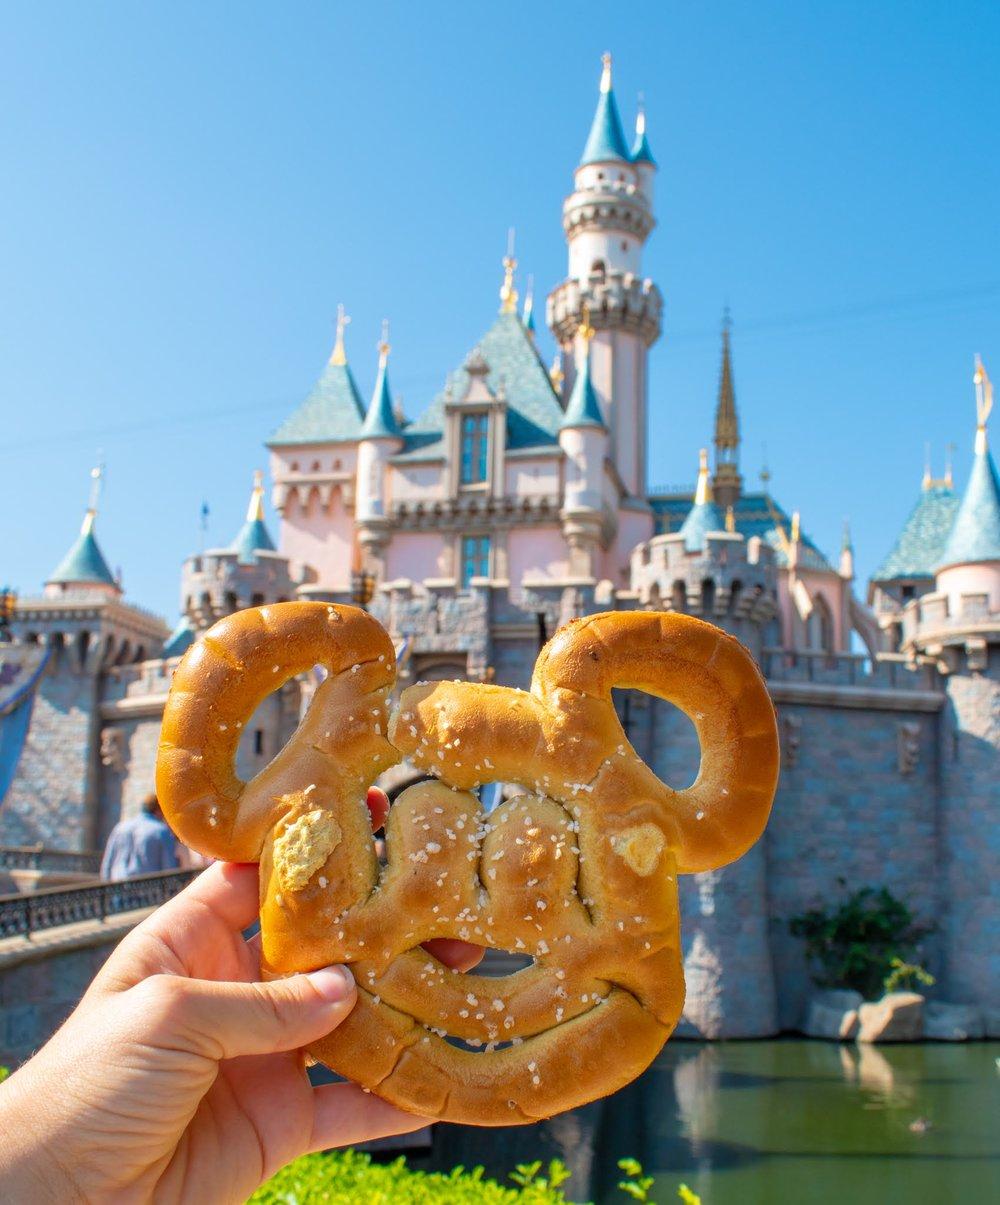 Uprooted-Traveler-Vegan-Disney-Land-mickey-soft-pretzel-vegan.jpg